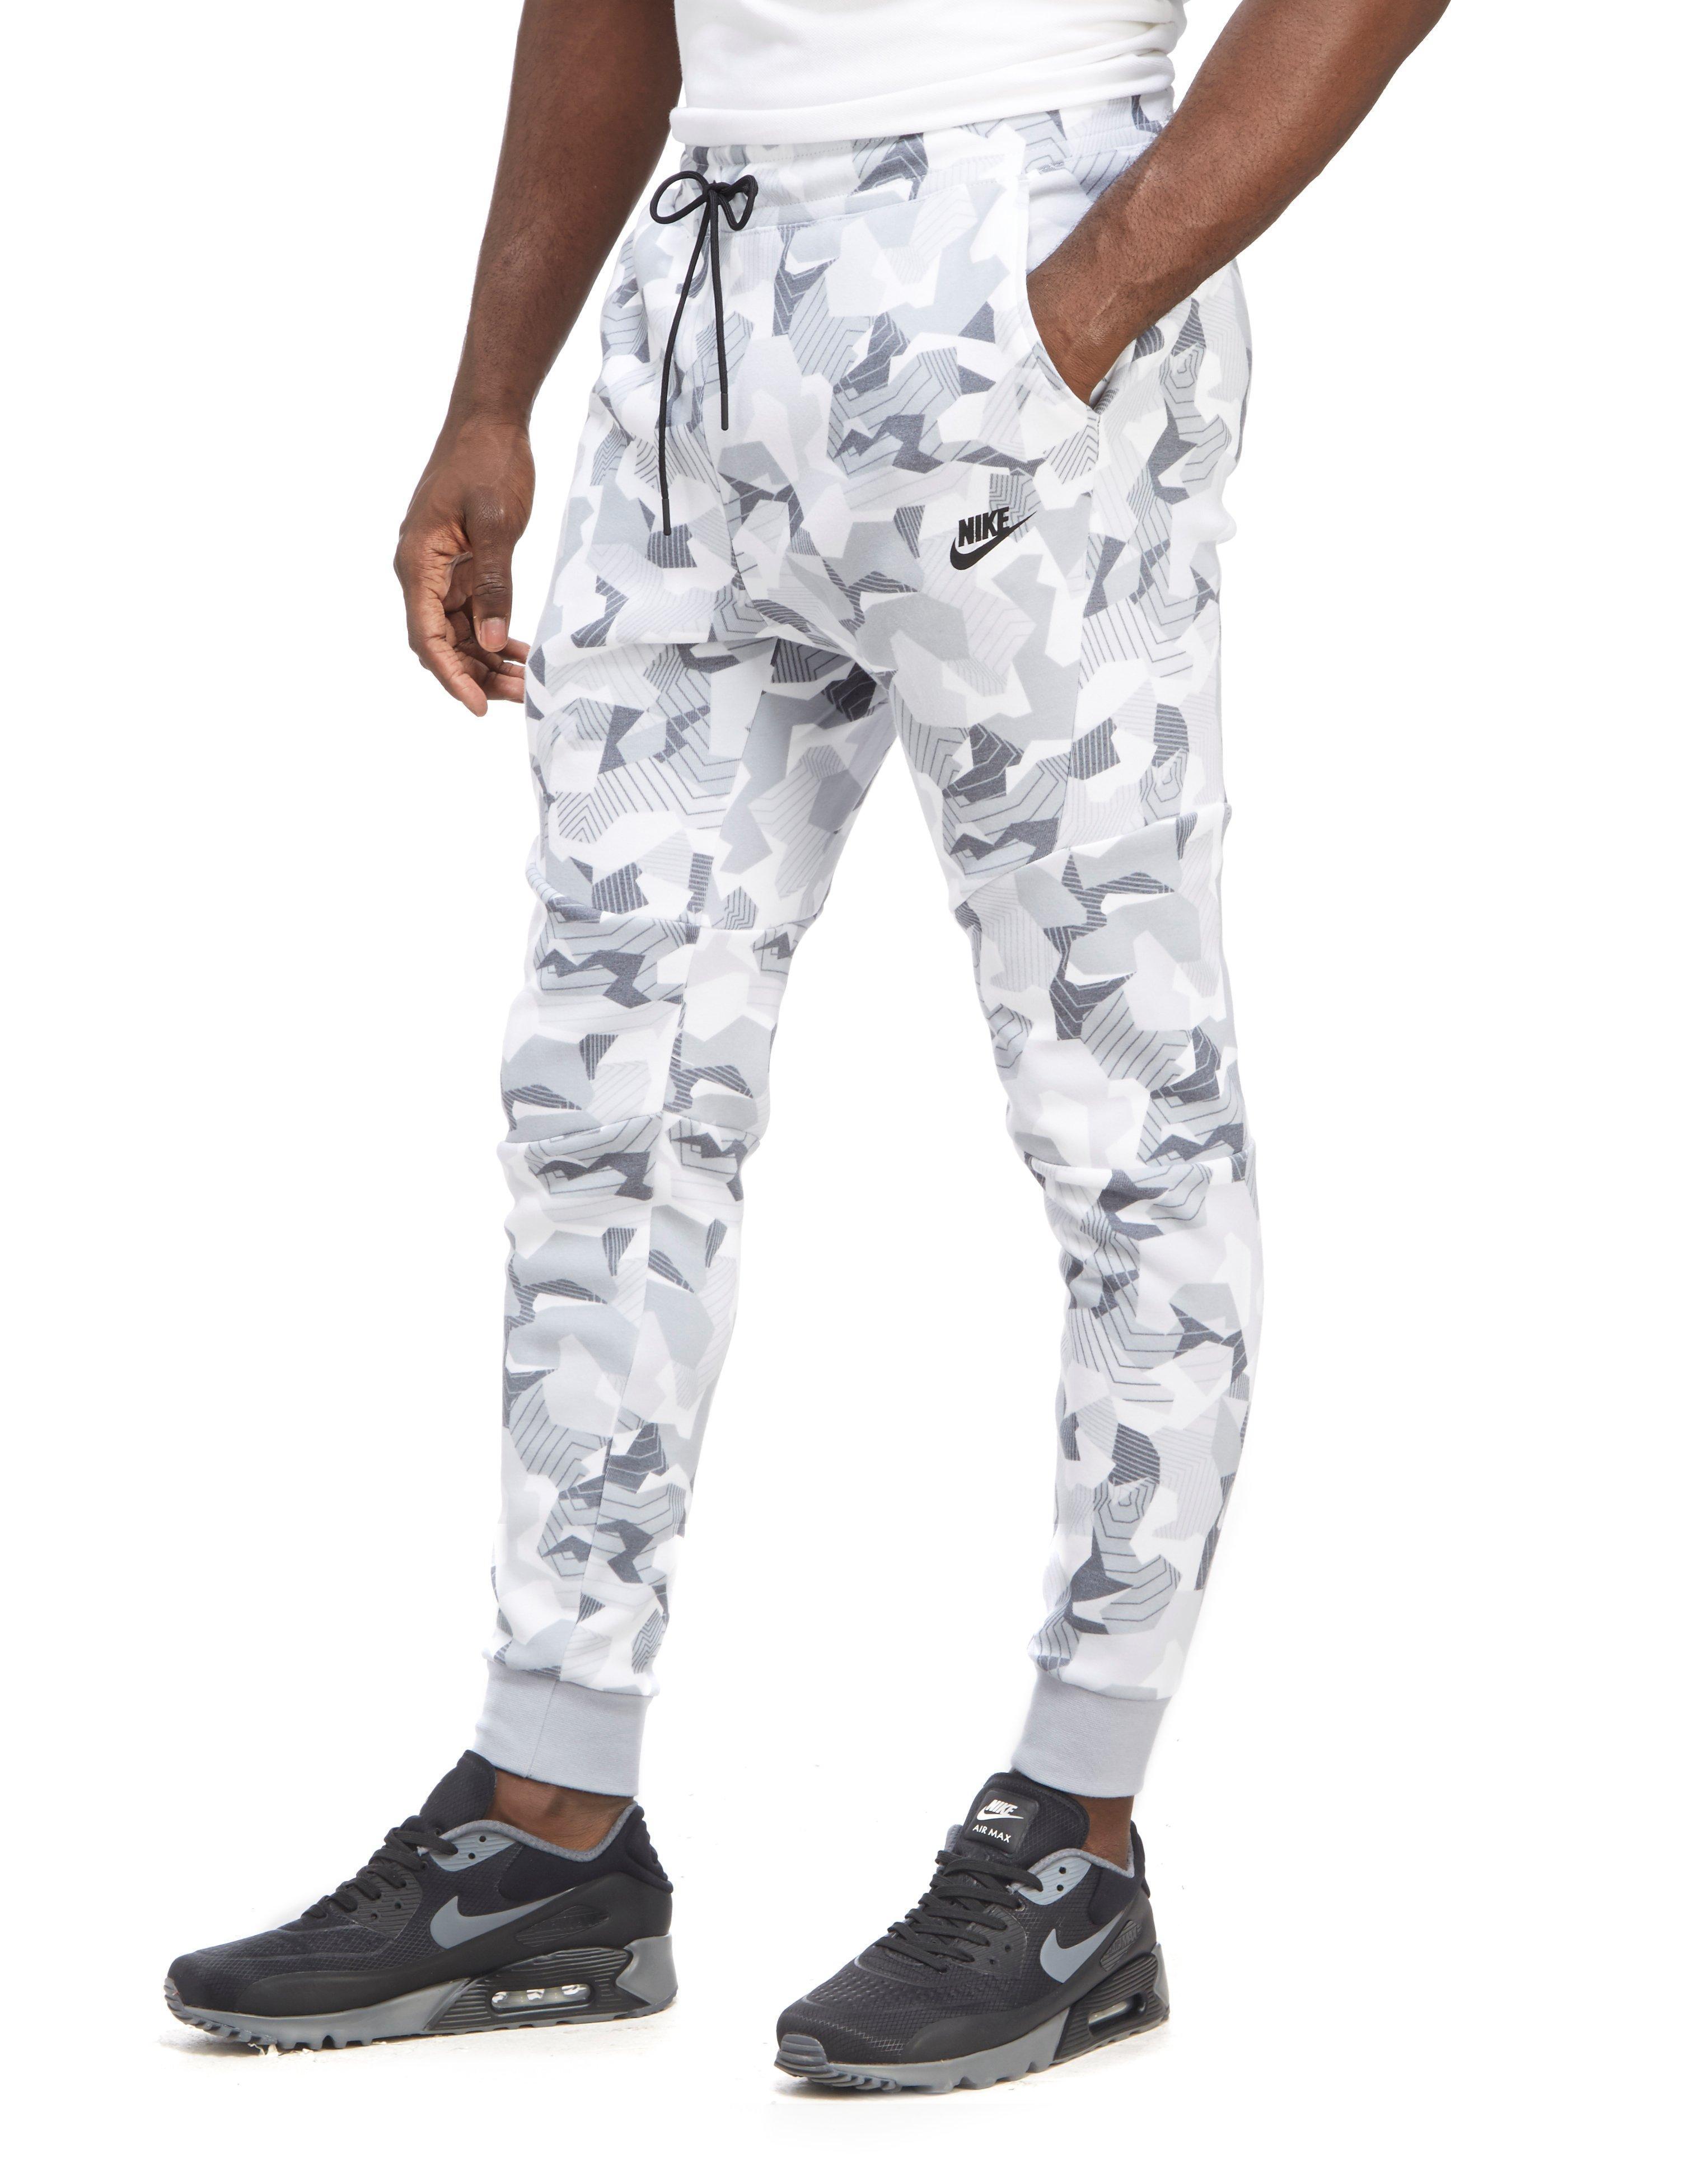 Lyst - Nike Tech Fleece Camouflage Pants in White for Men 864a0cb1b